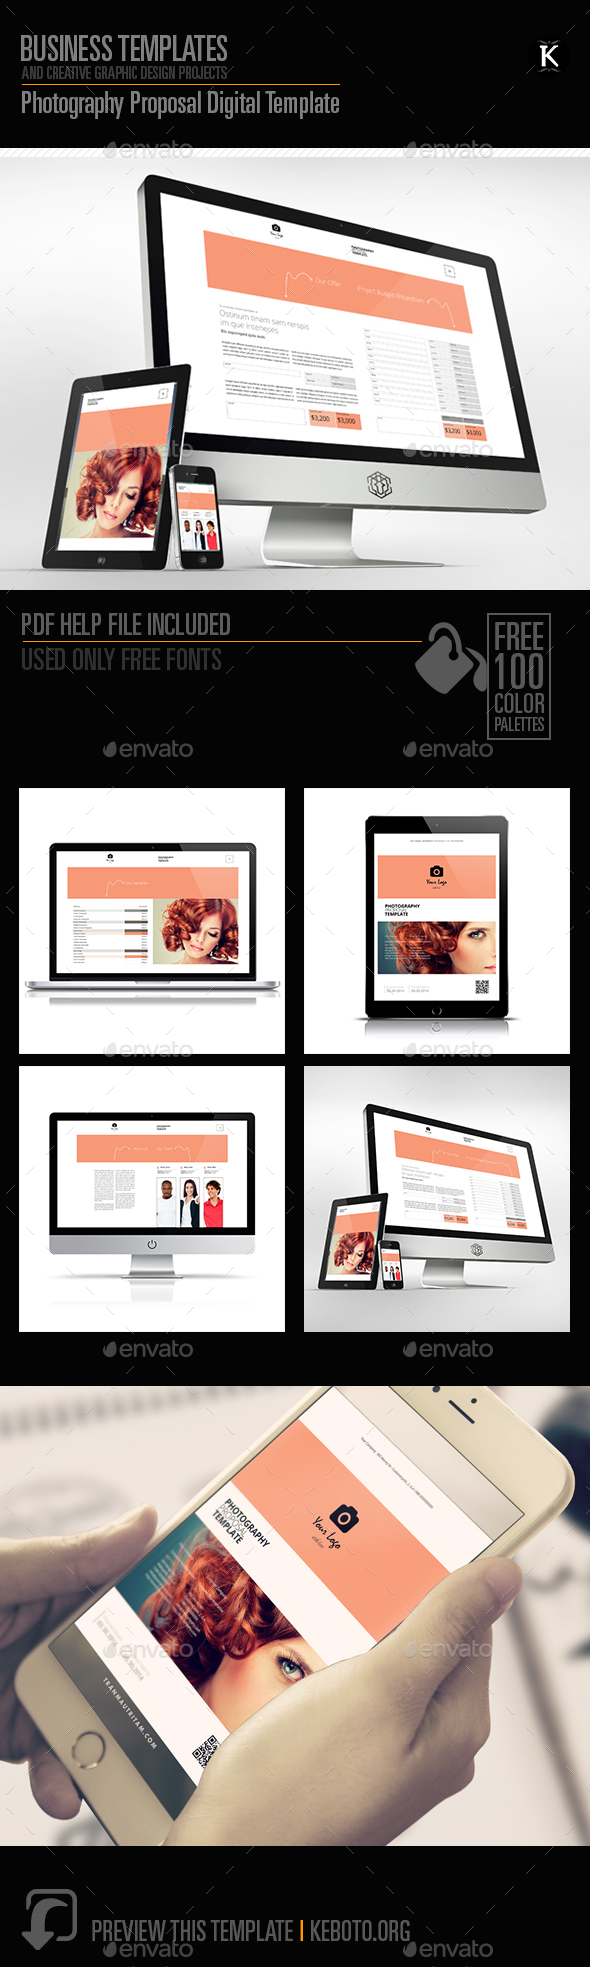 Photography Proposal Digital Template - ePublishing